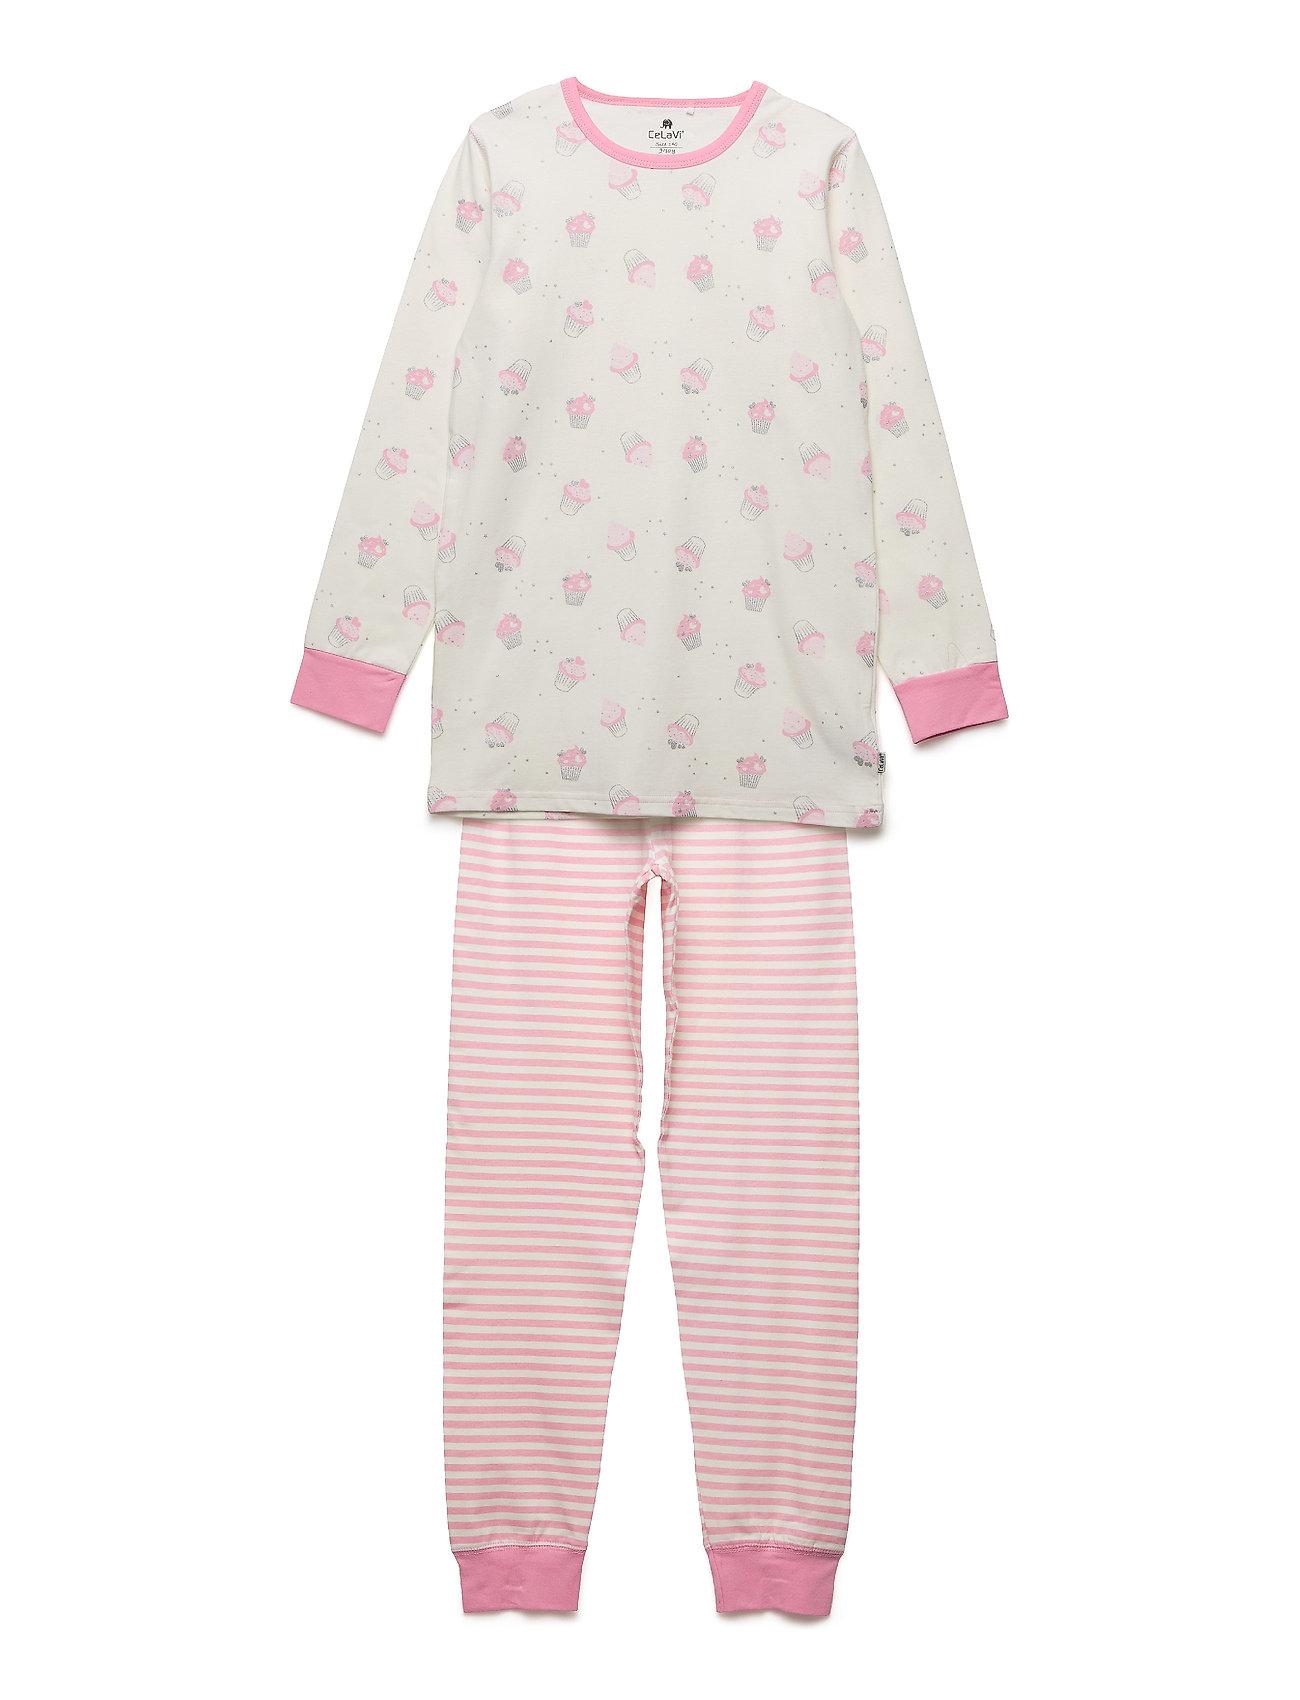 CeLaVi Pyjamas w. AOP  ON HANGER - MARSHMALLOW WHITE